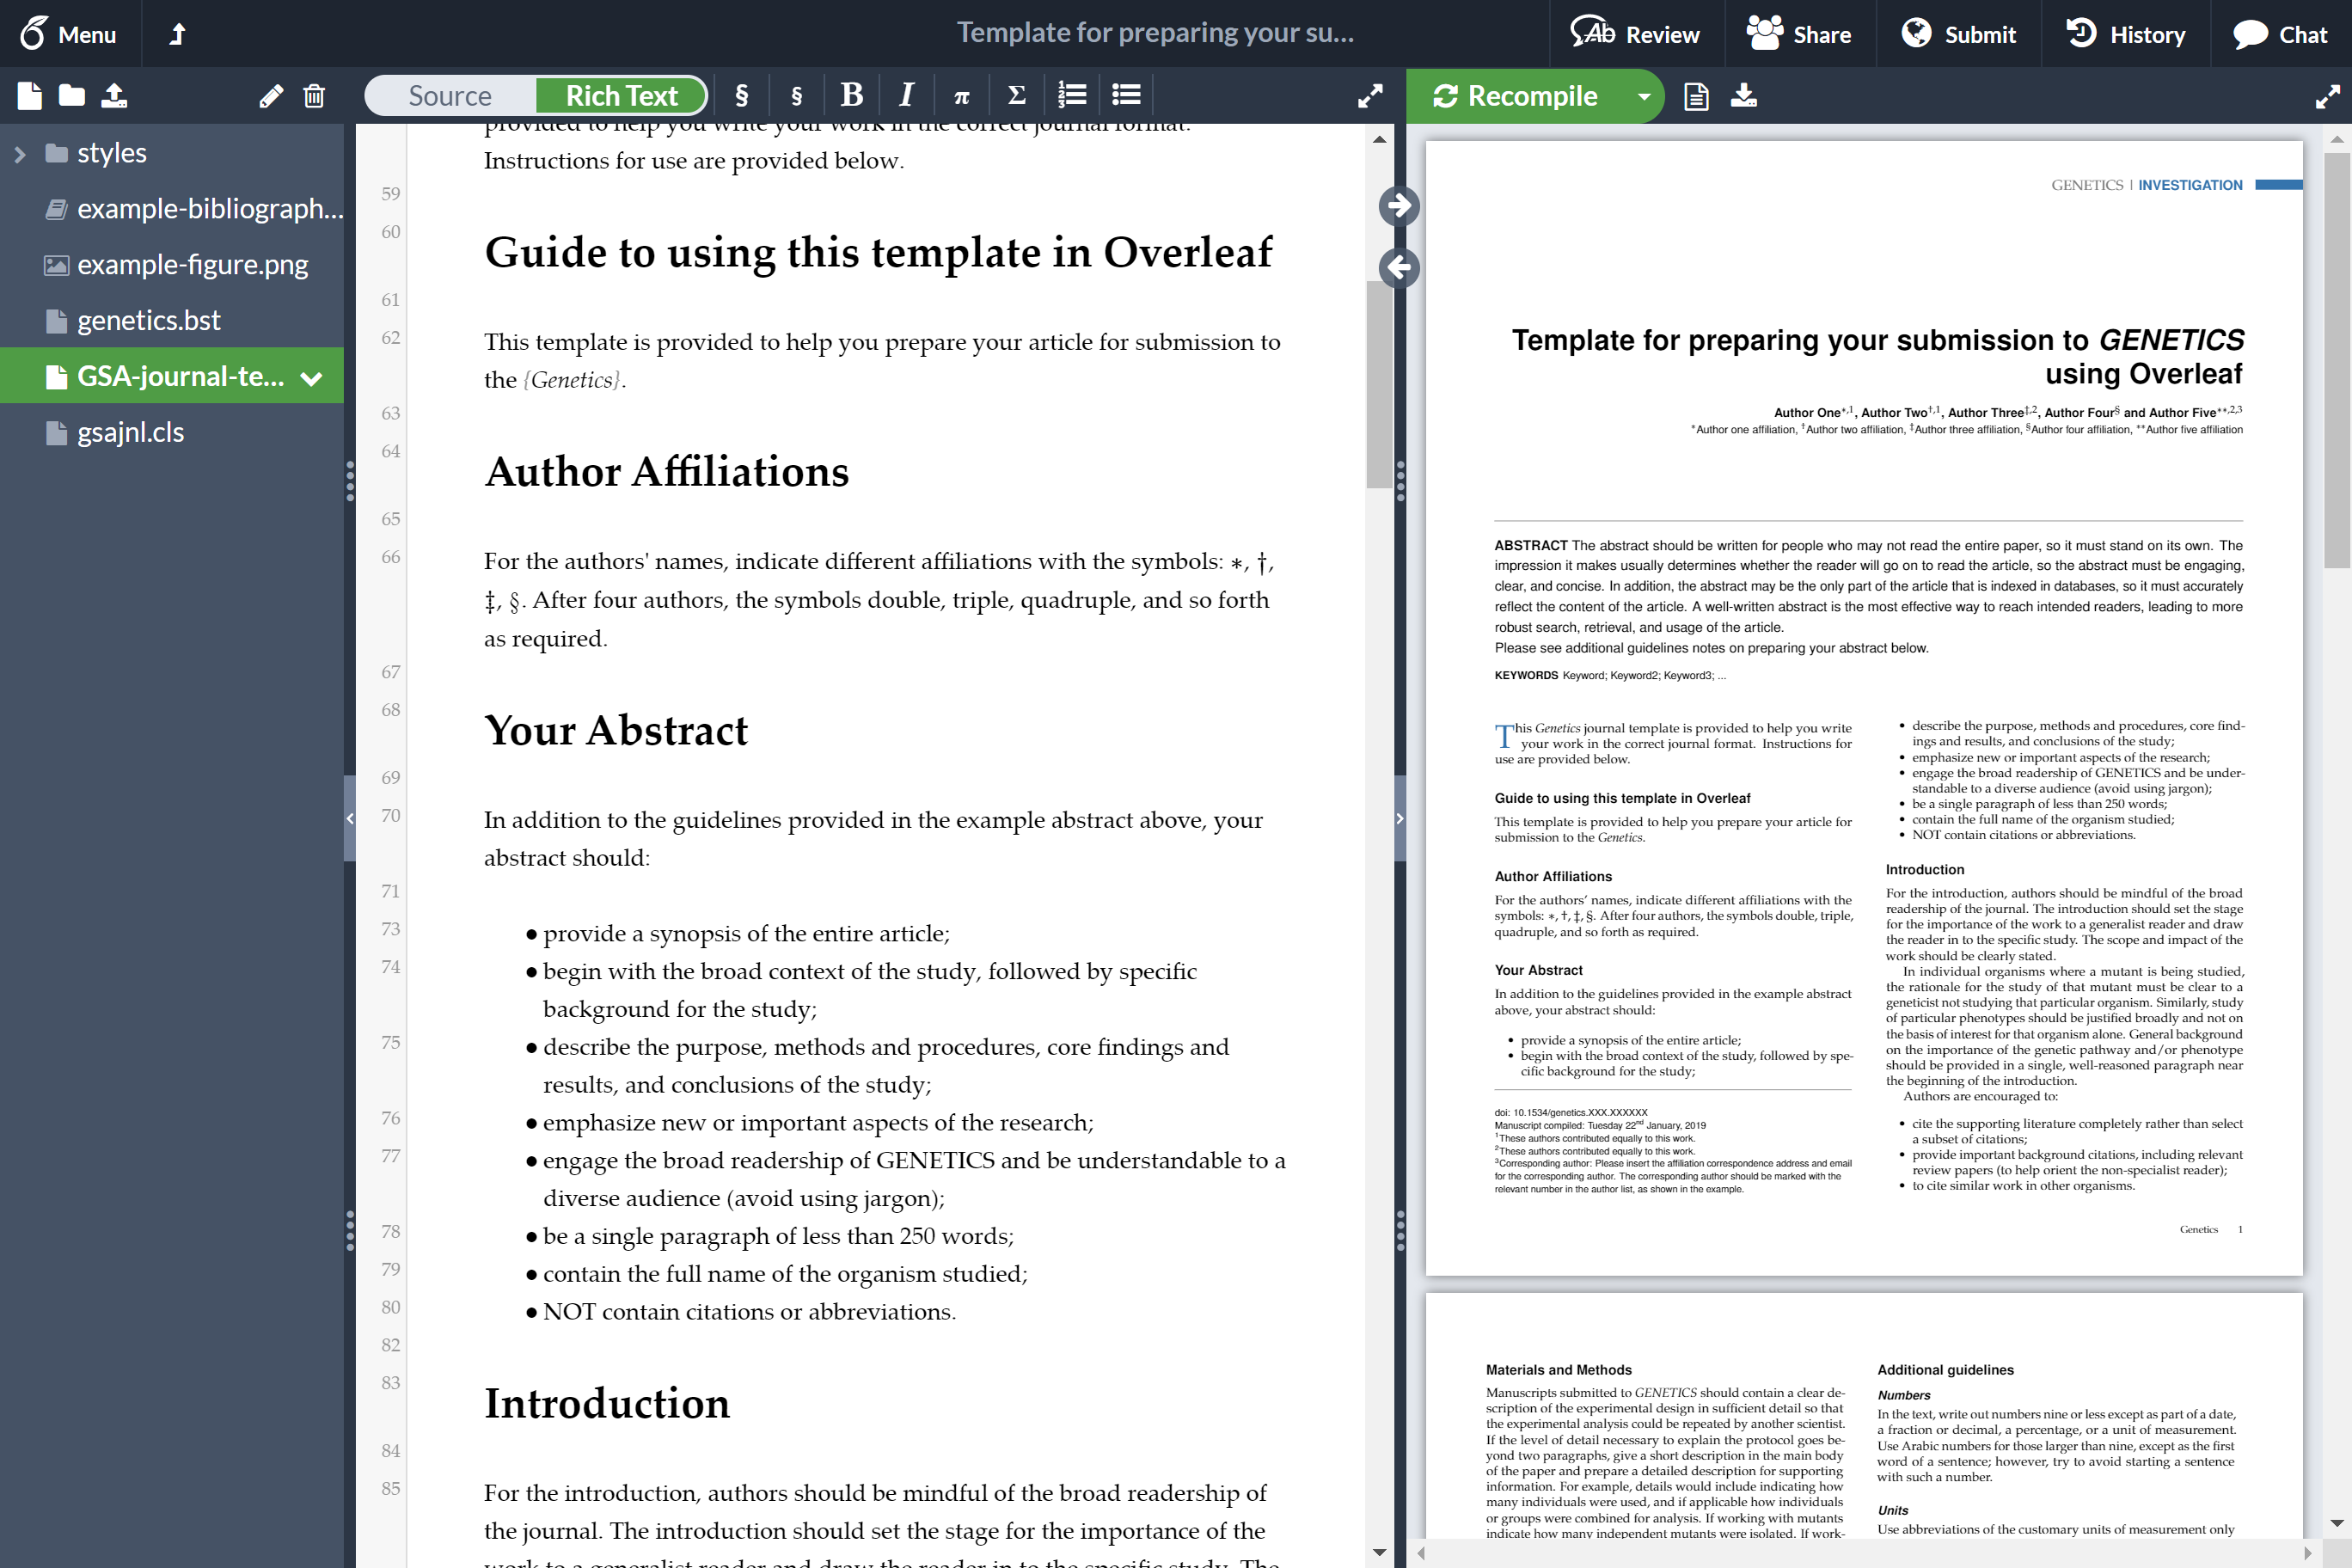 Screenshot guide to using template